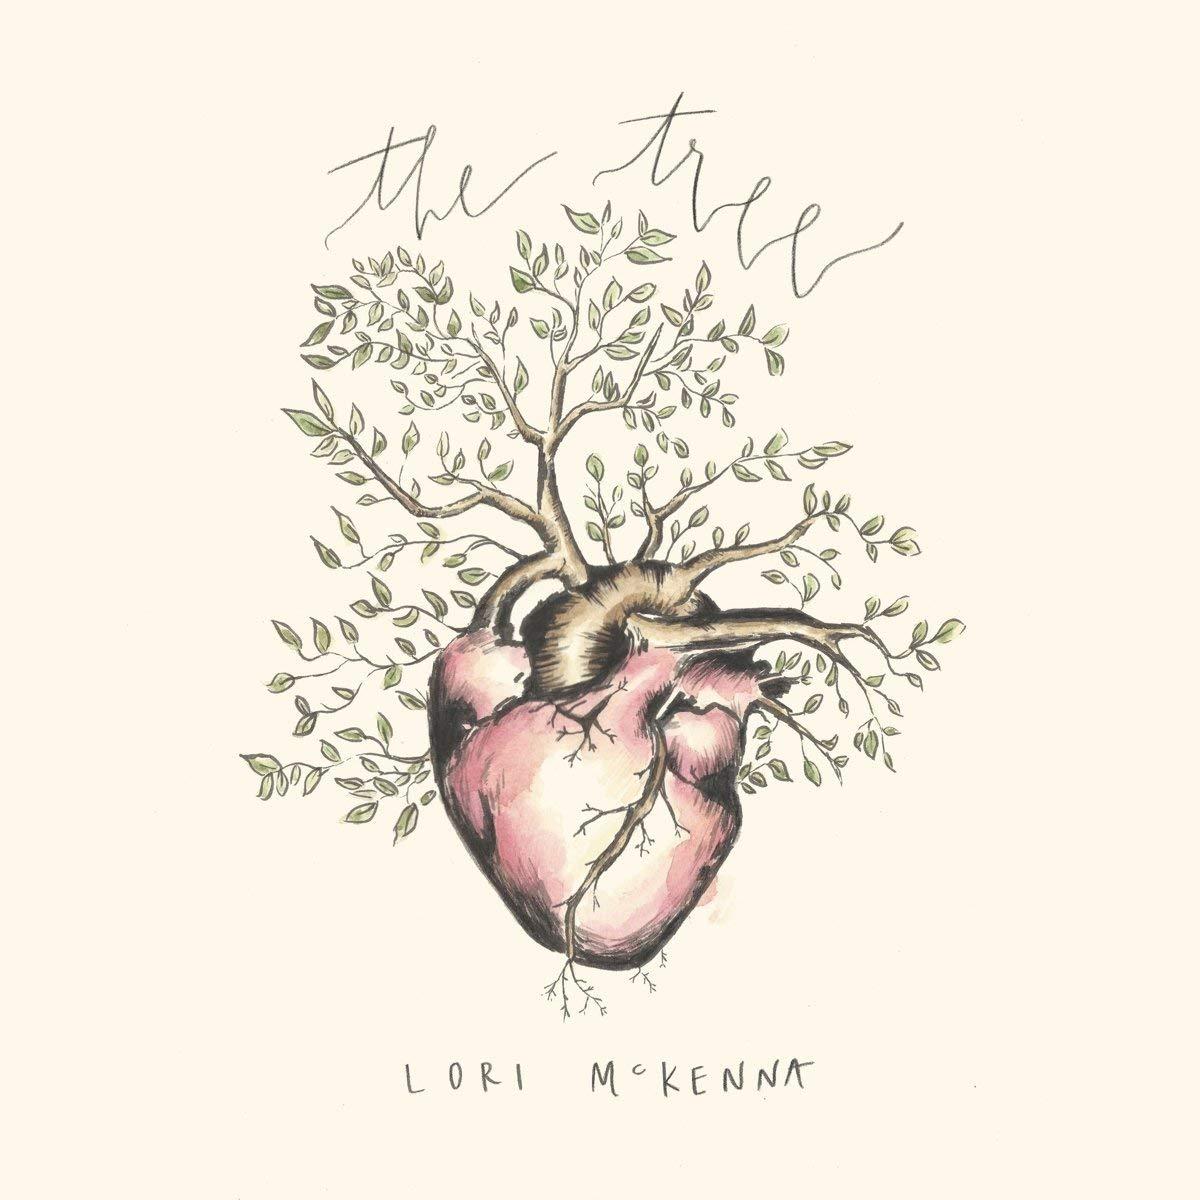 Lori McKenna - The Tree - cover art